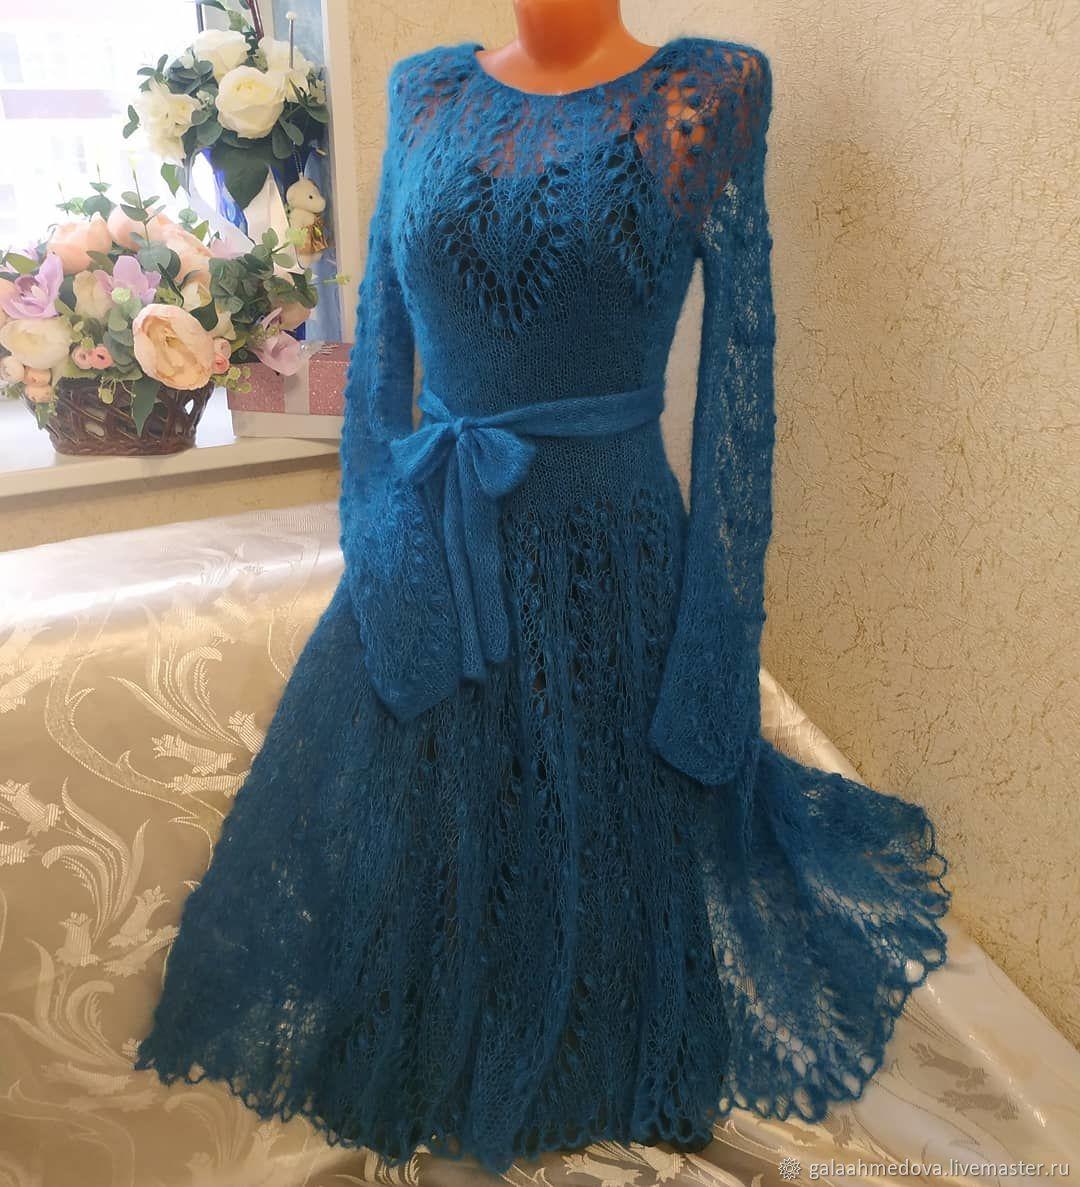 dress 'openwork dream' handmade, Dresses, Dmitrov,  Фото №1